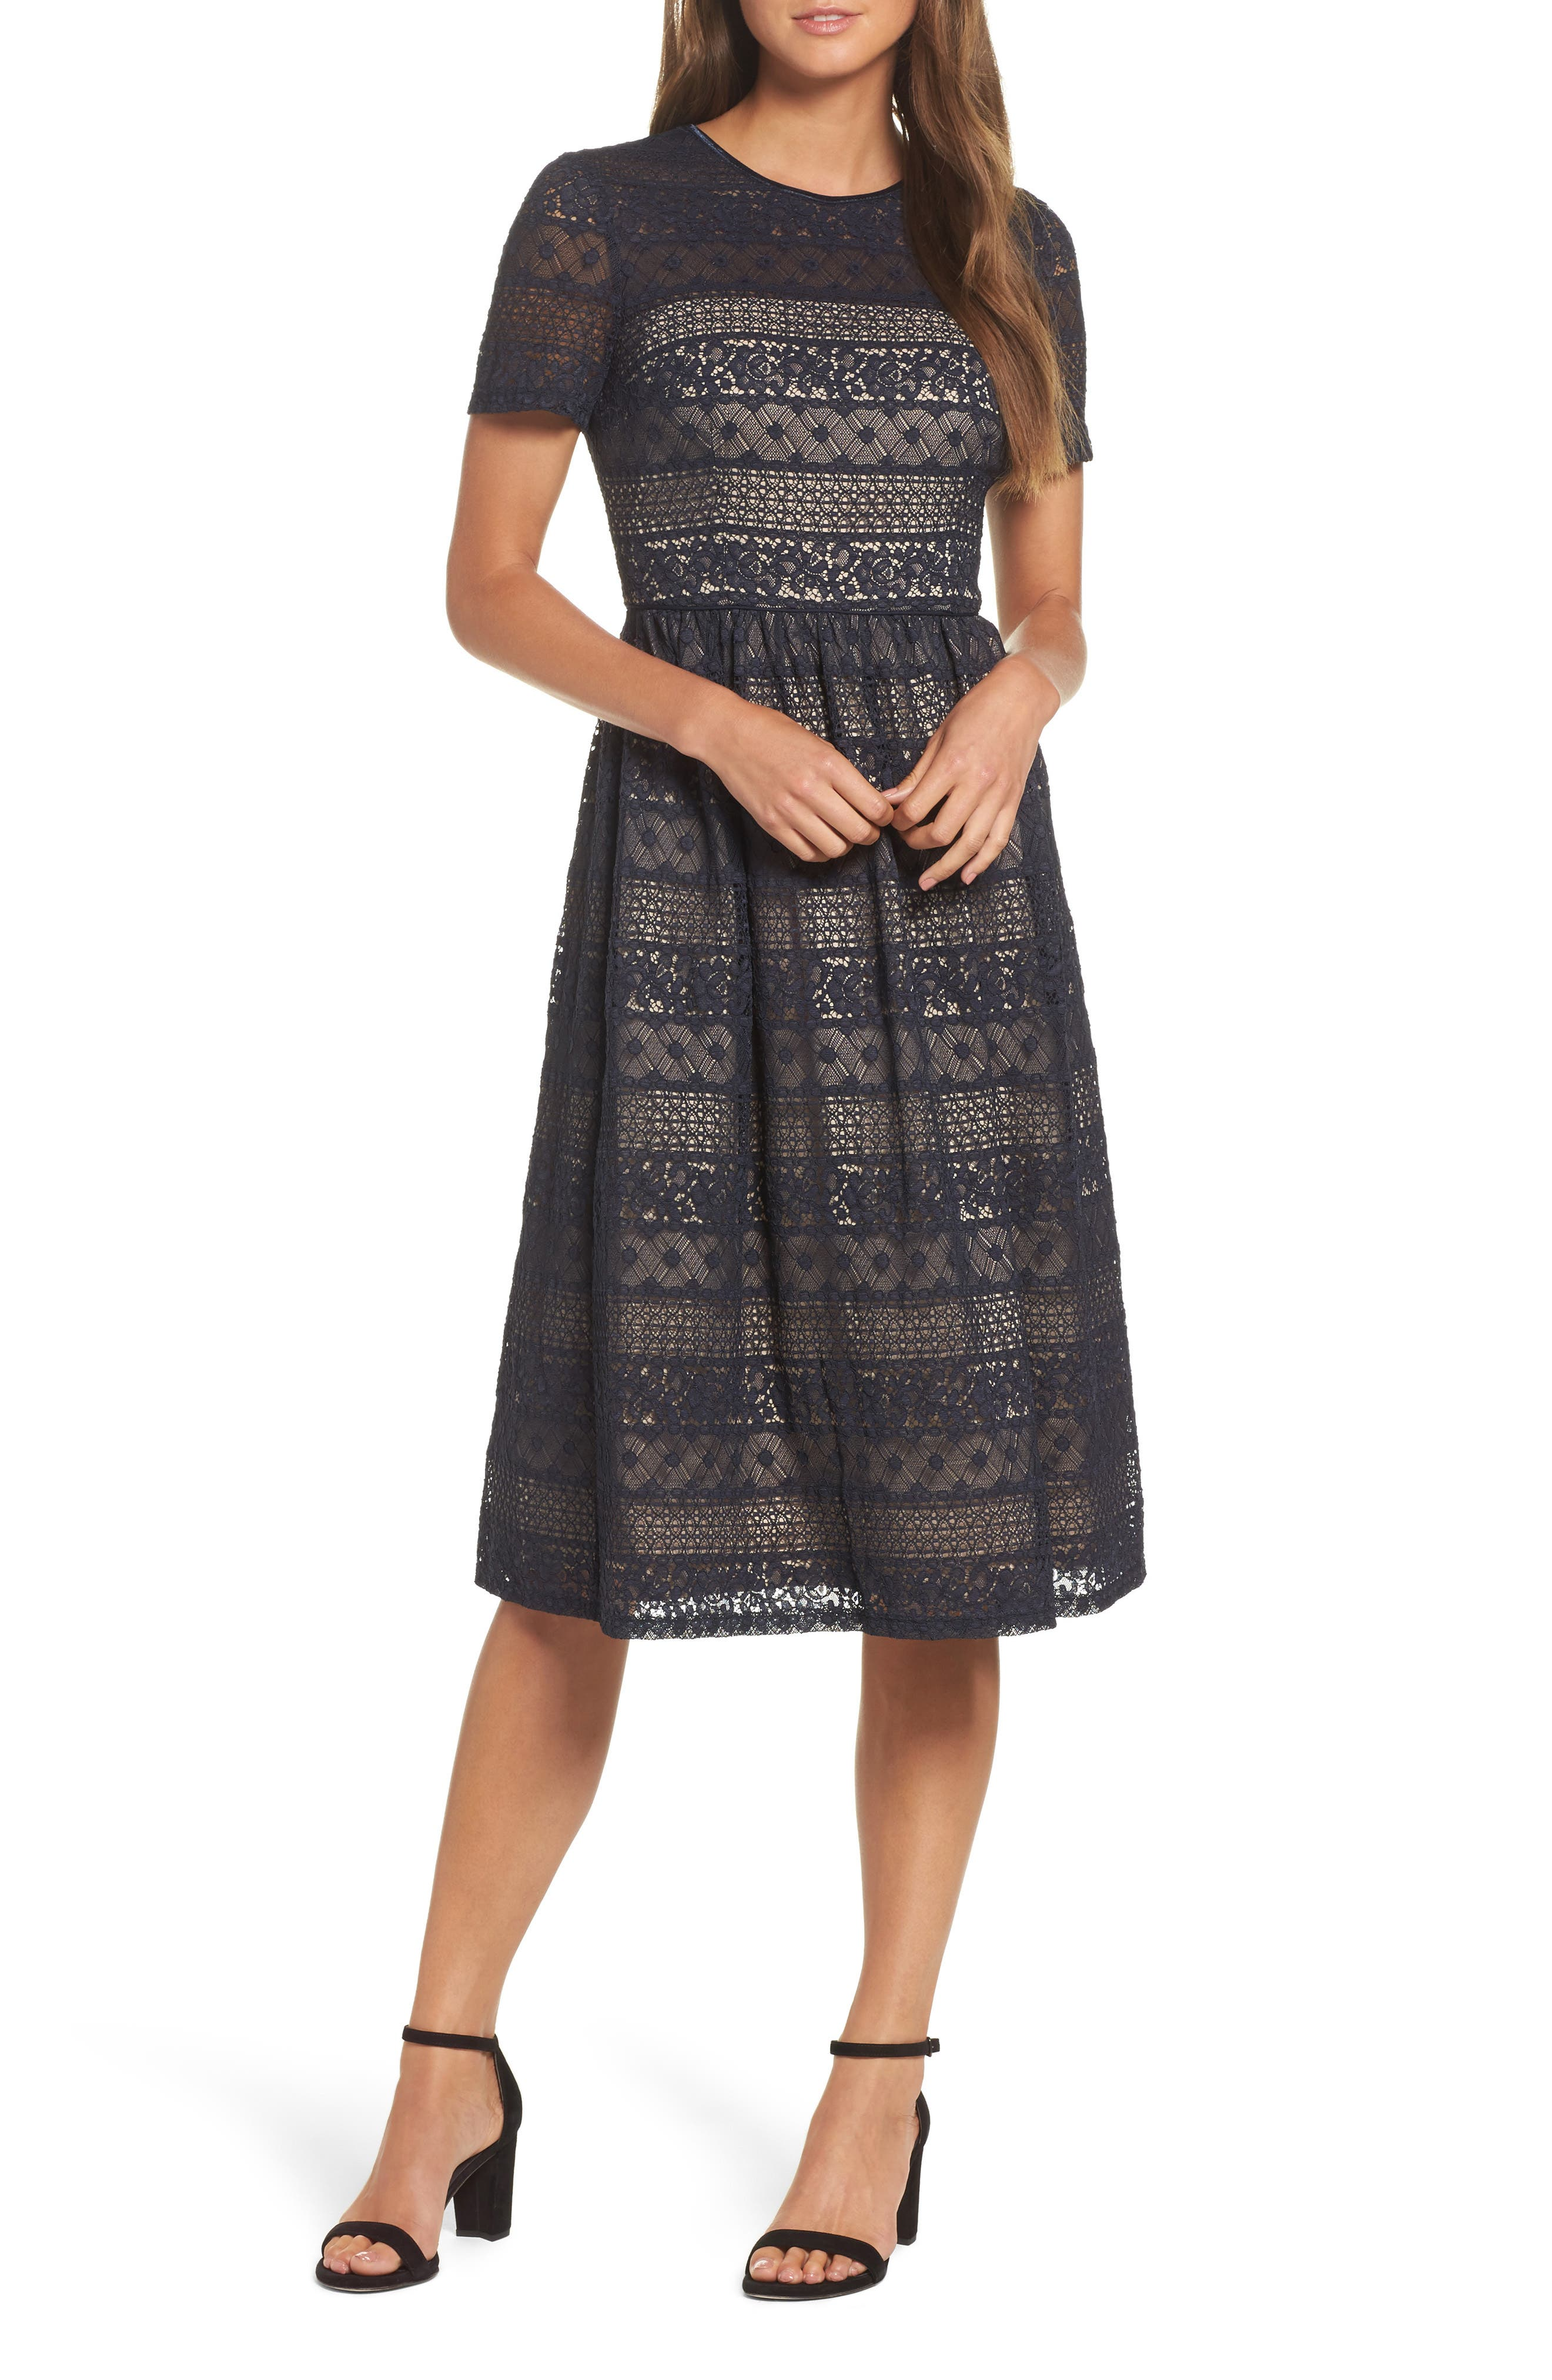 Alternate Image 1 Selected - Maggy London Lace Midi Dress (Regular & Petite)